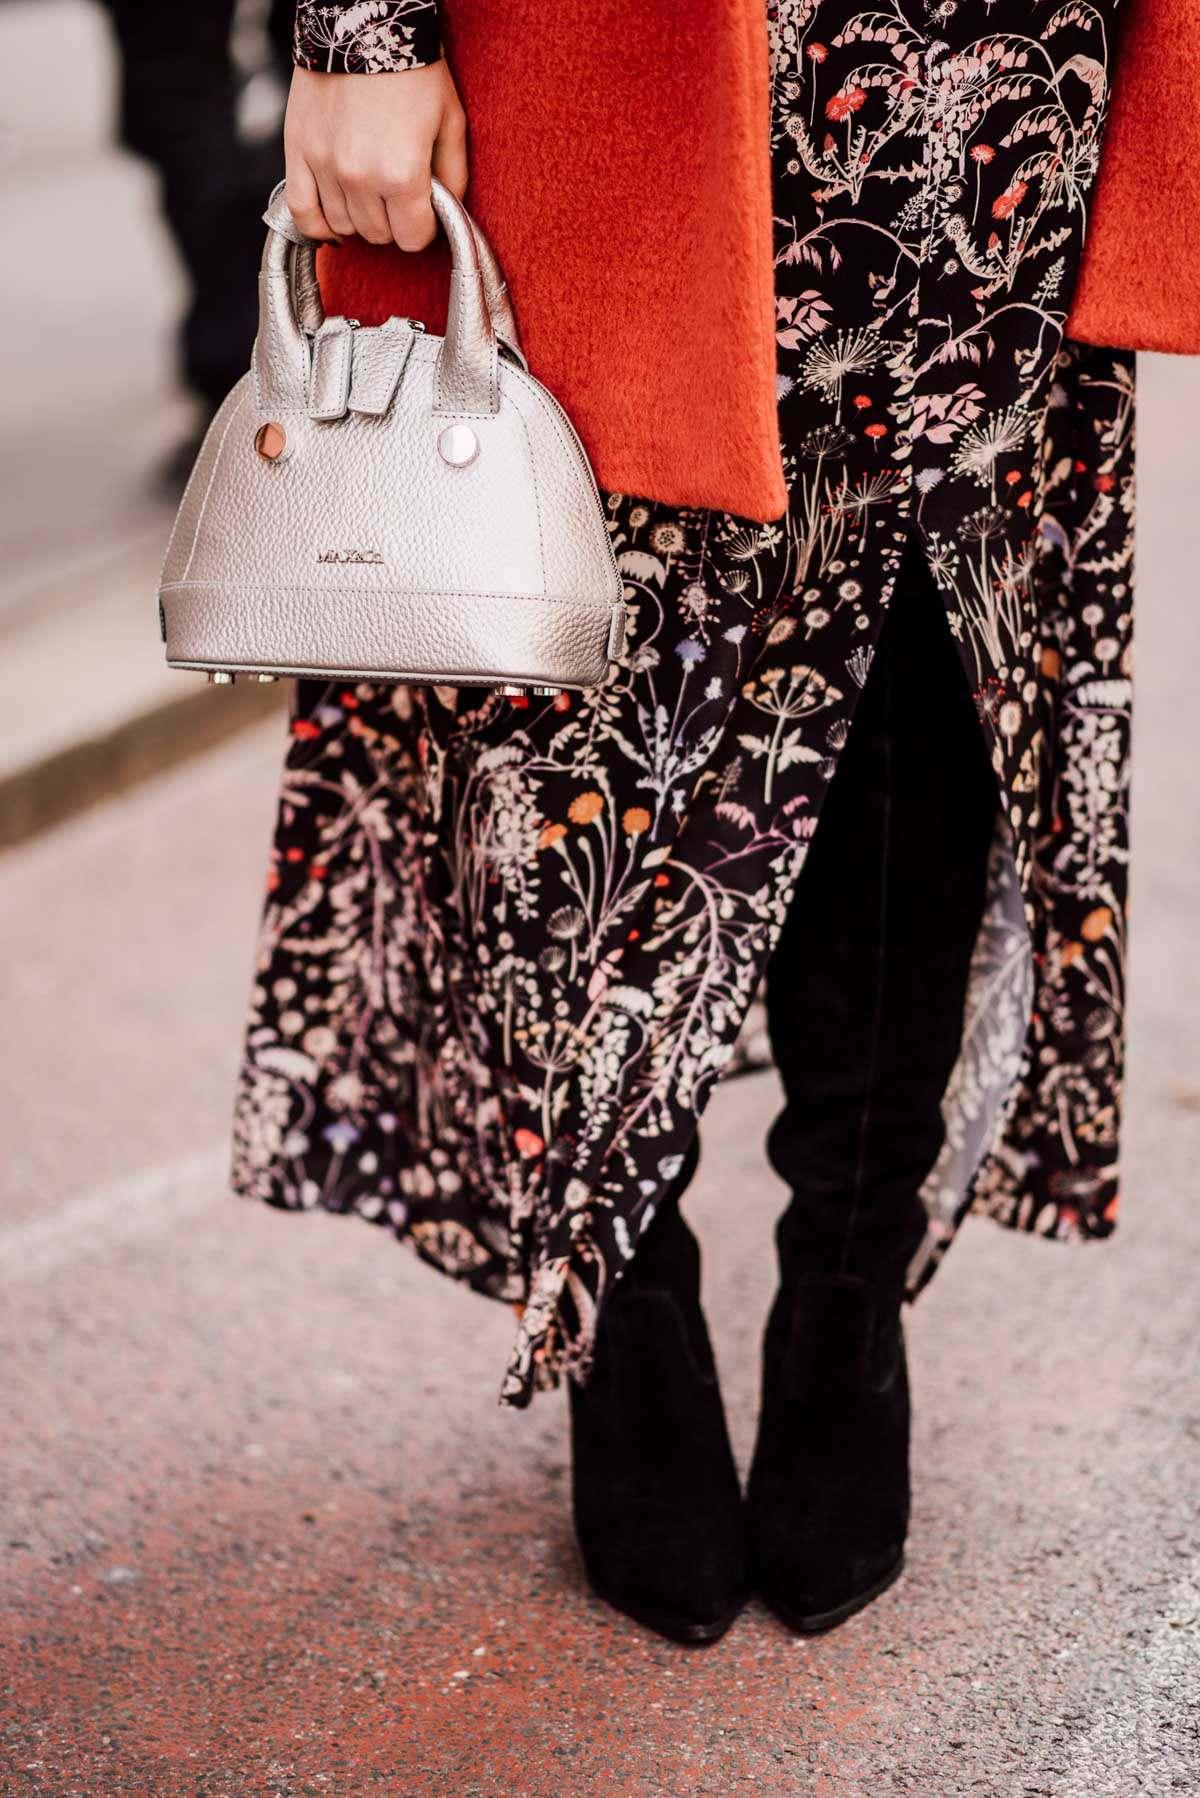 Max&Co. Miss Juno bag